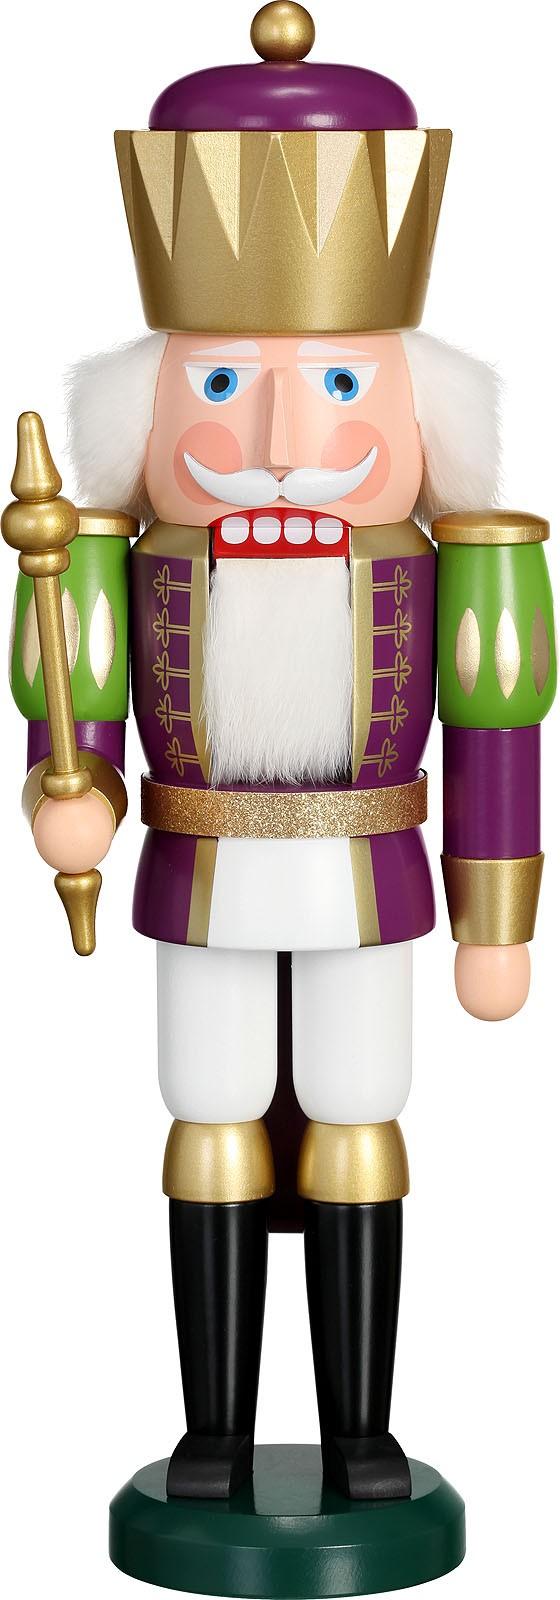 Nussknacker König, purpur-weiß